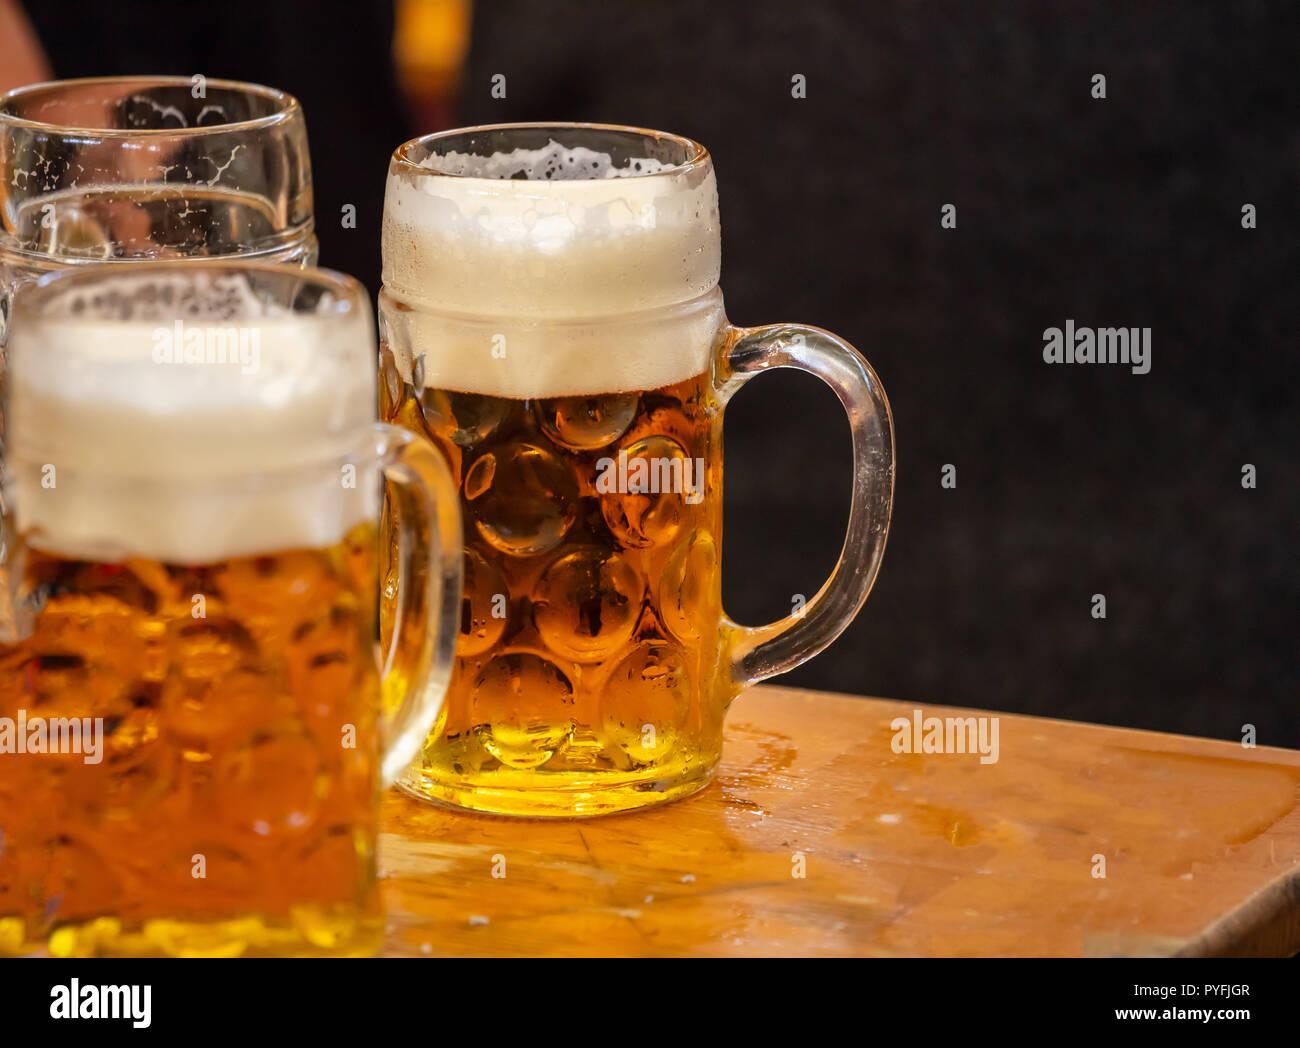 Boccali Di Birra Tedeschi Immagini E Fotos Stock Alamy